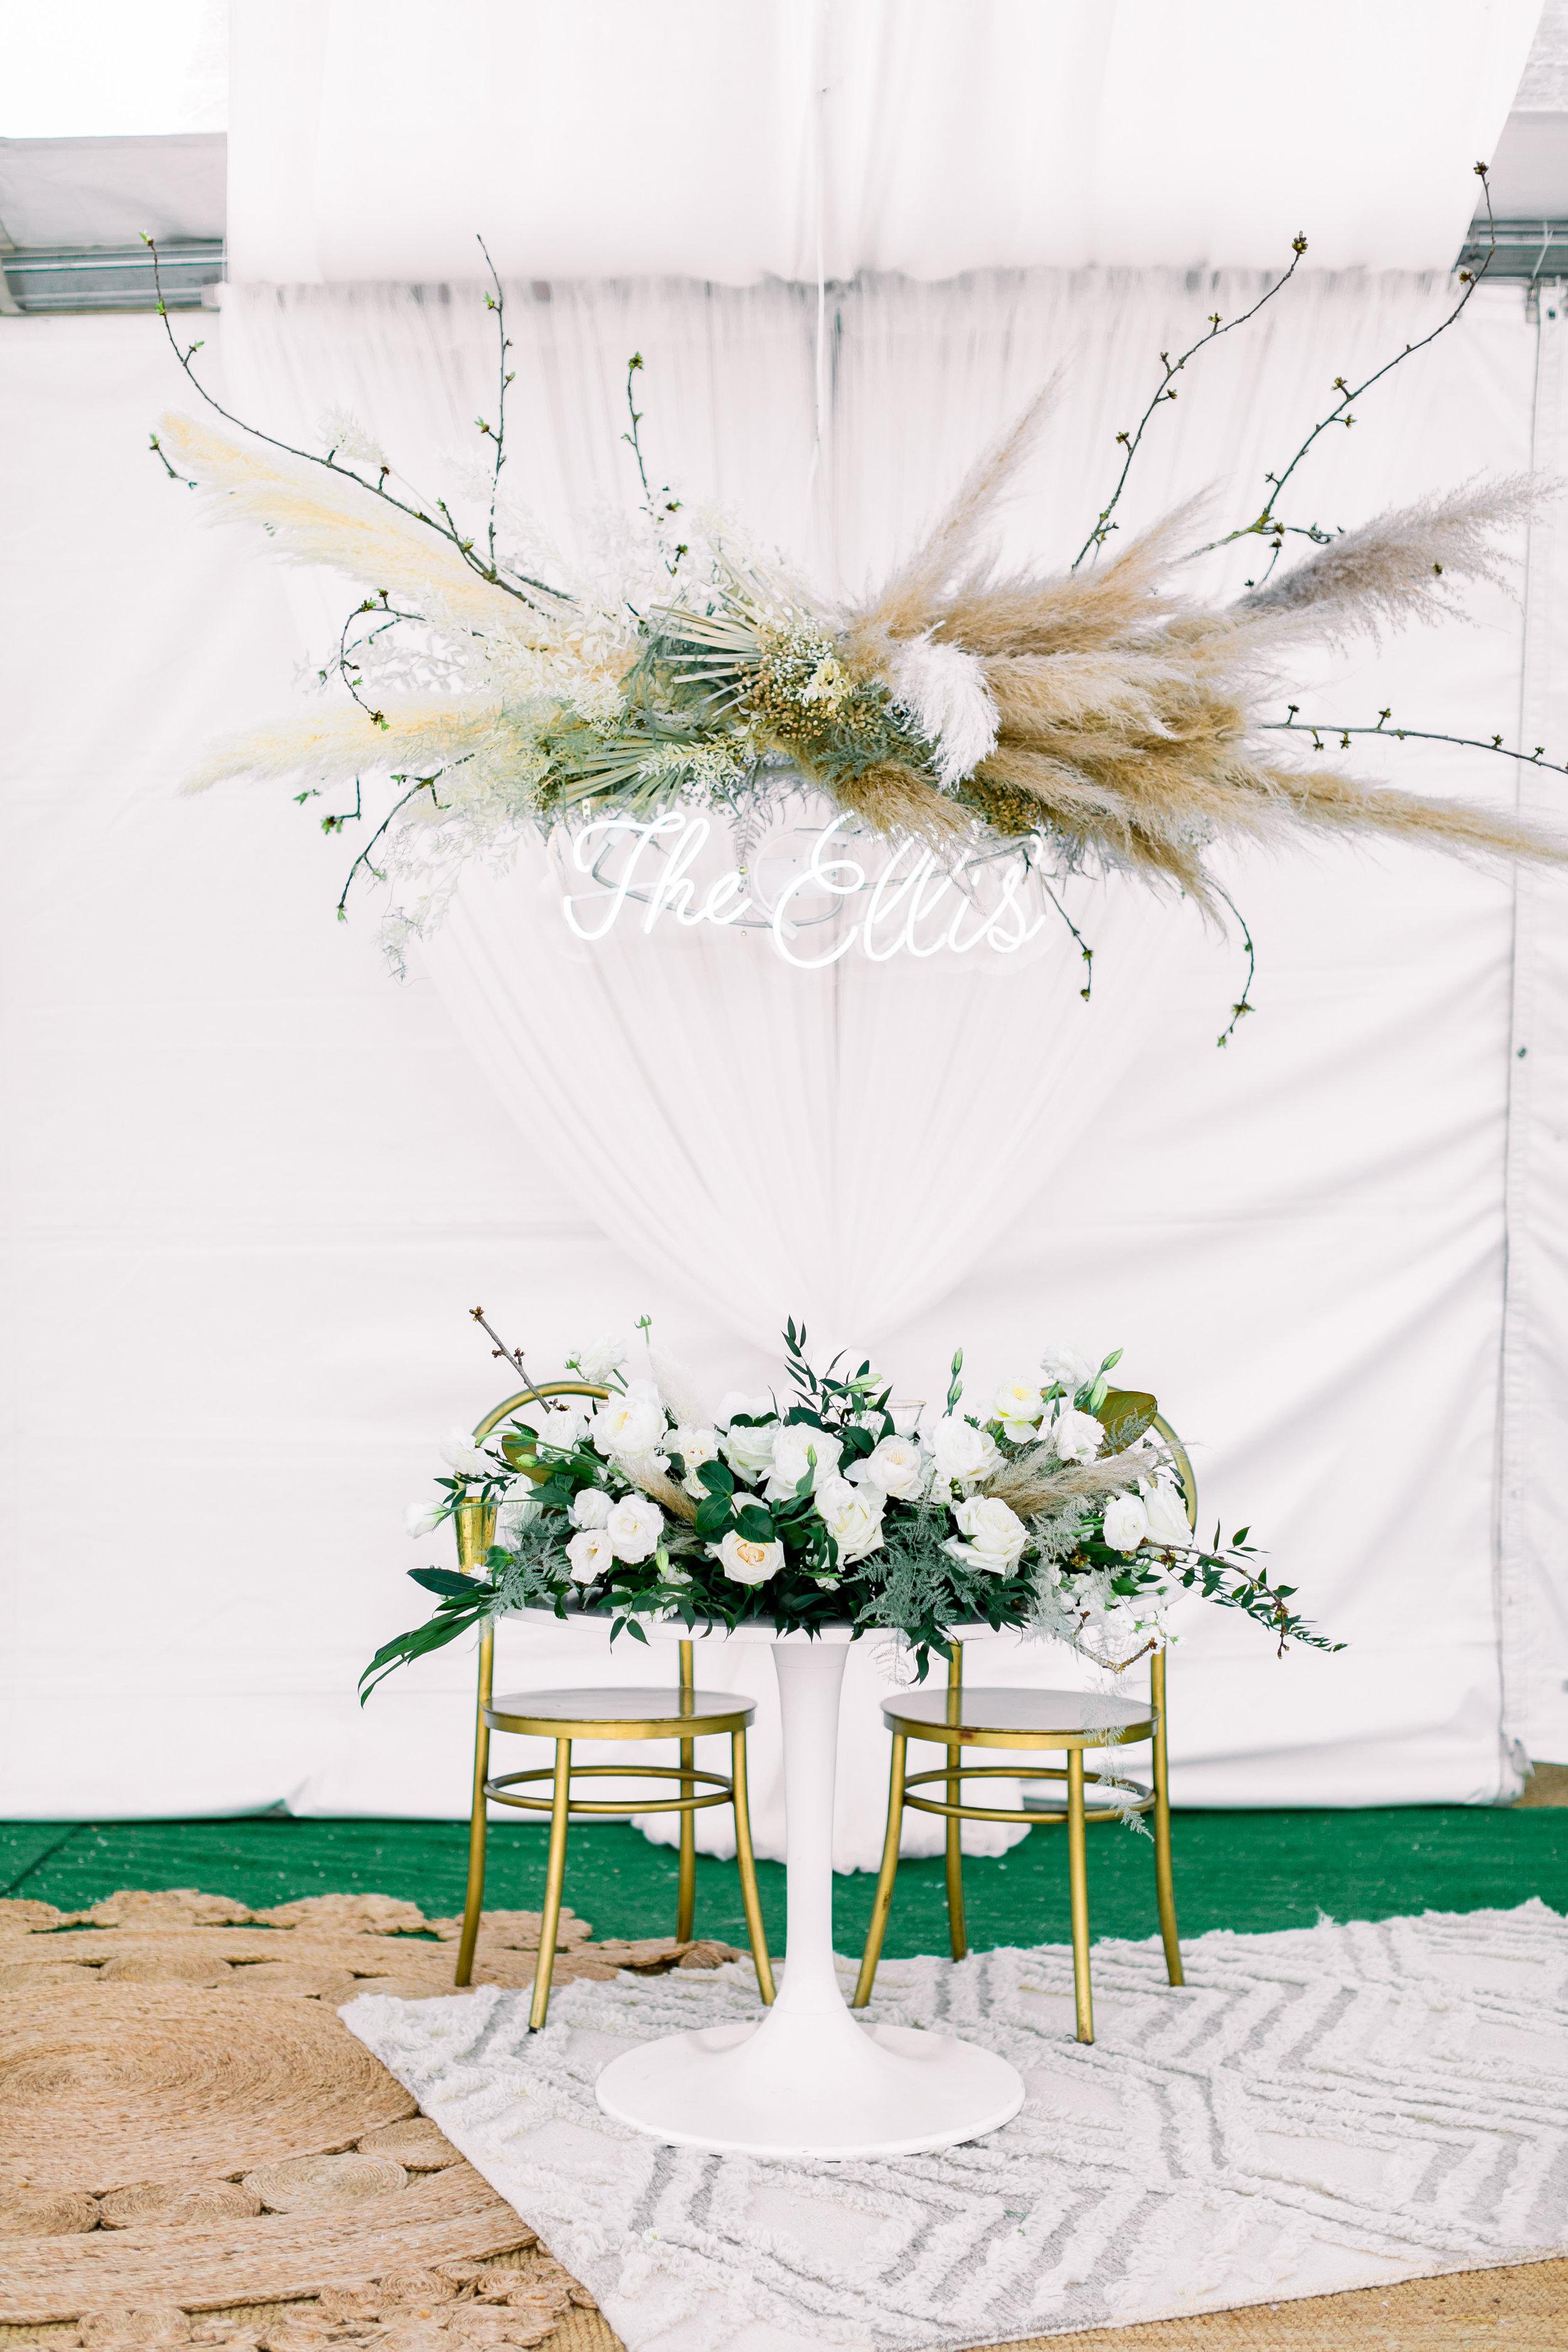 Levi & Amelia's Wedding - Natalie Schutt Photography - Details-69.jpg